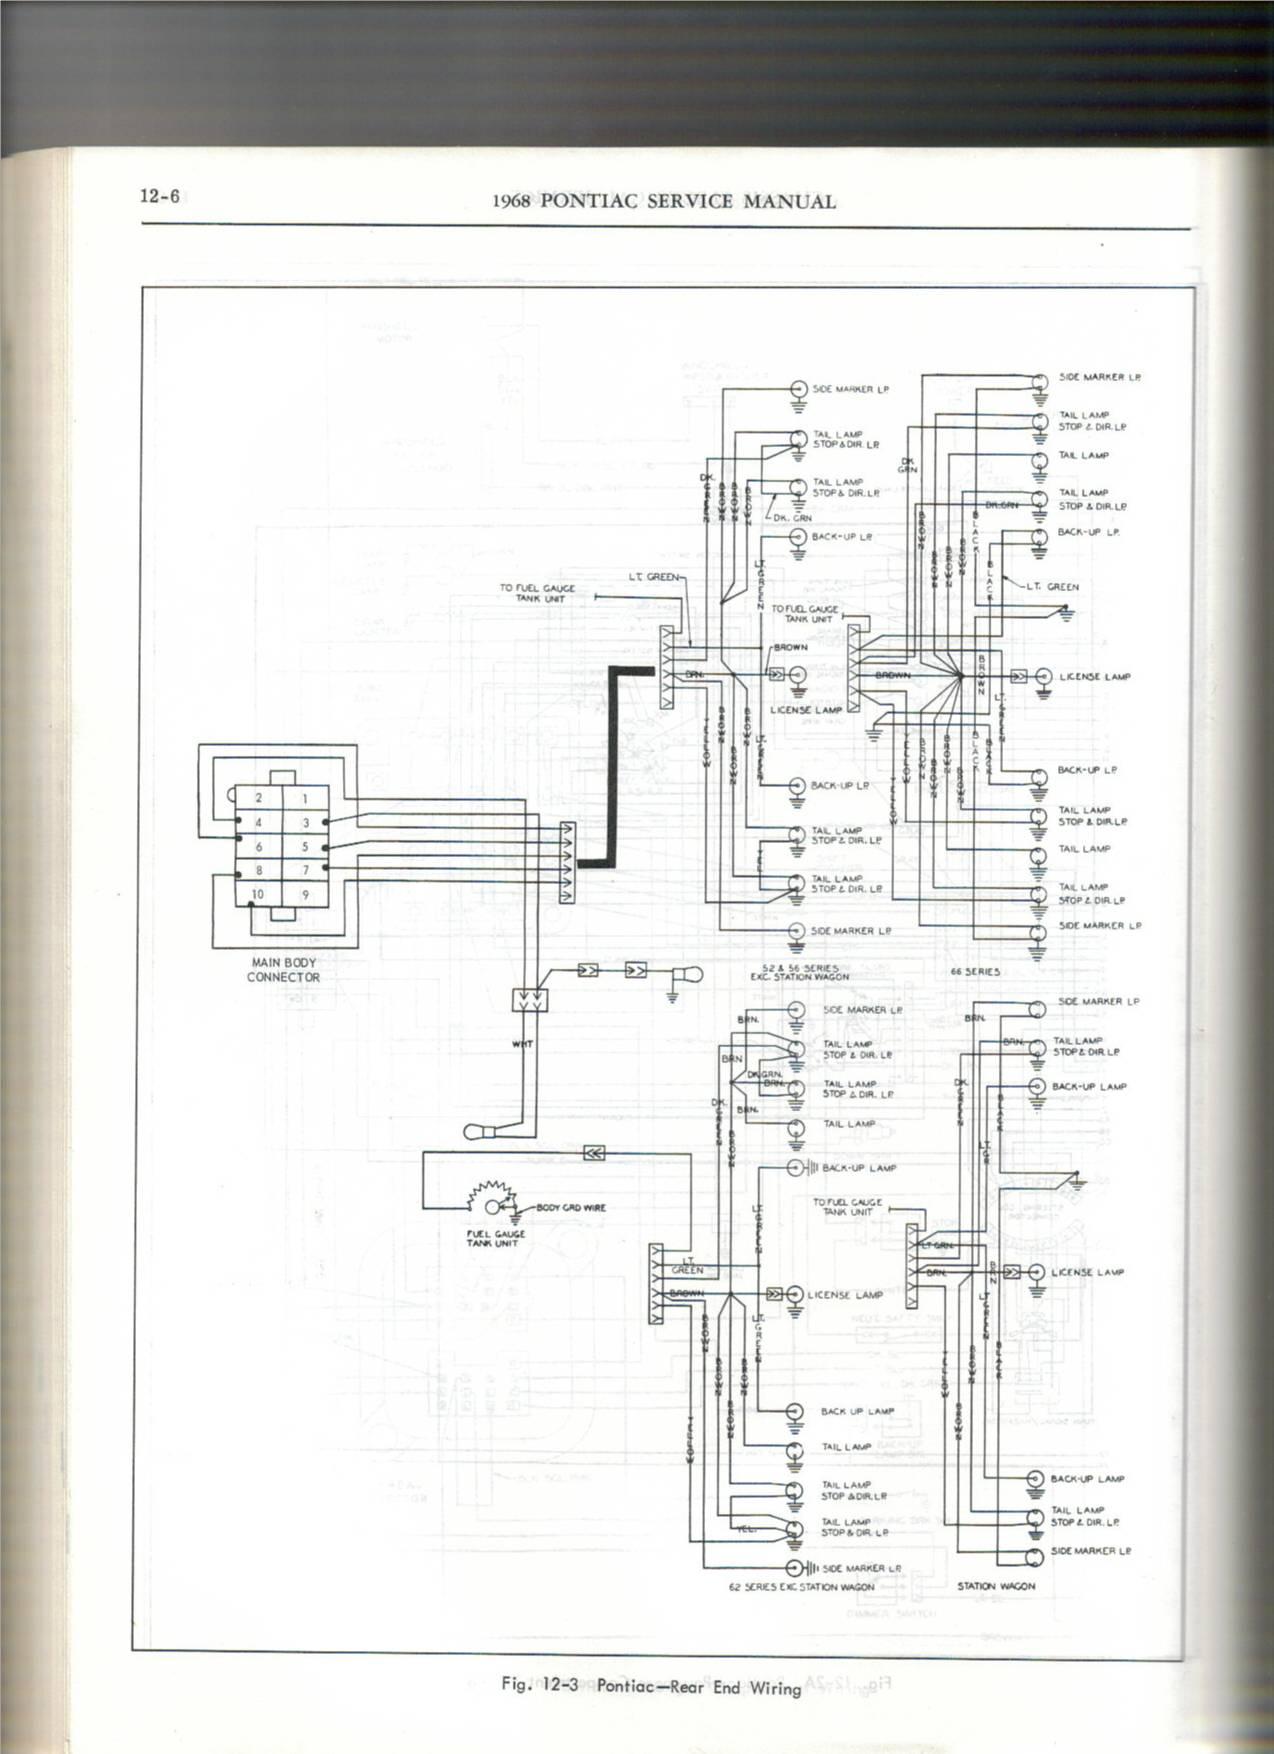 gto wiring diagram scans - page 2 - pontiac gto forum, Wiring diagram